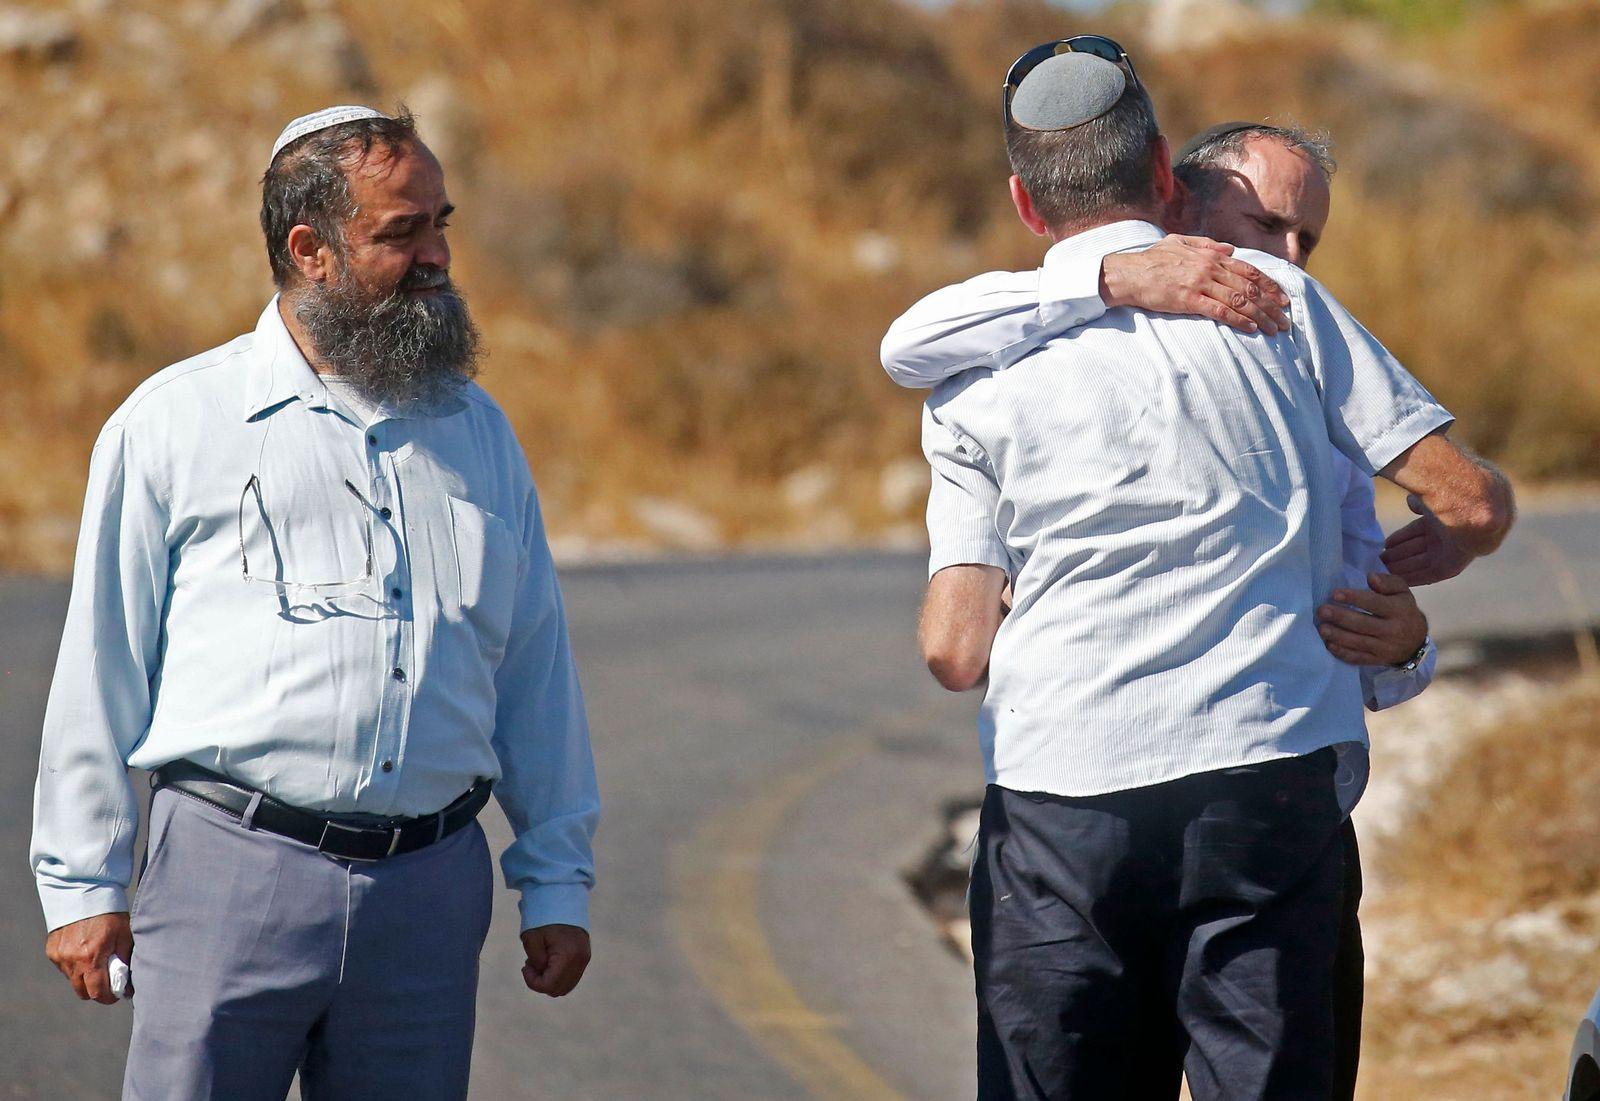 Israelischer Soldat erstochen/ Corporal Dvir Sorek